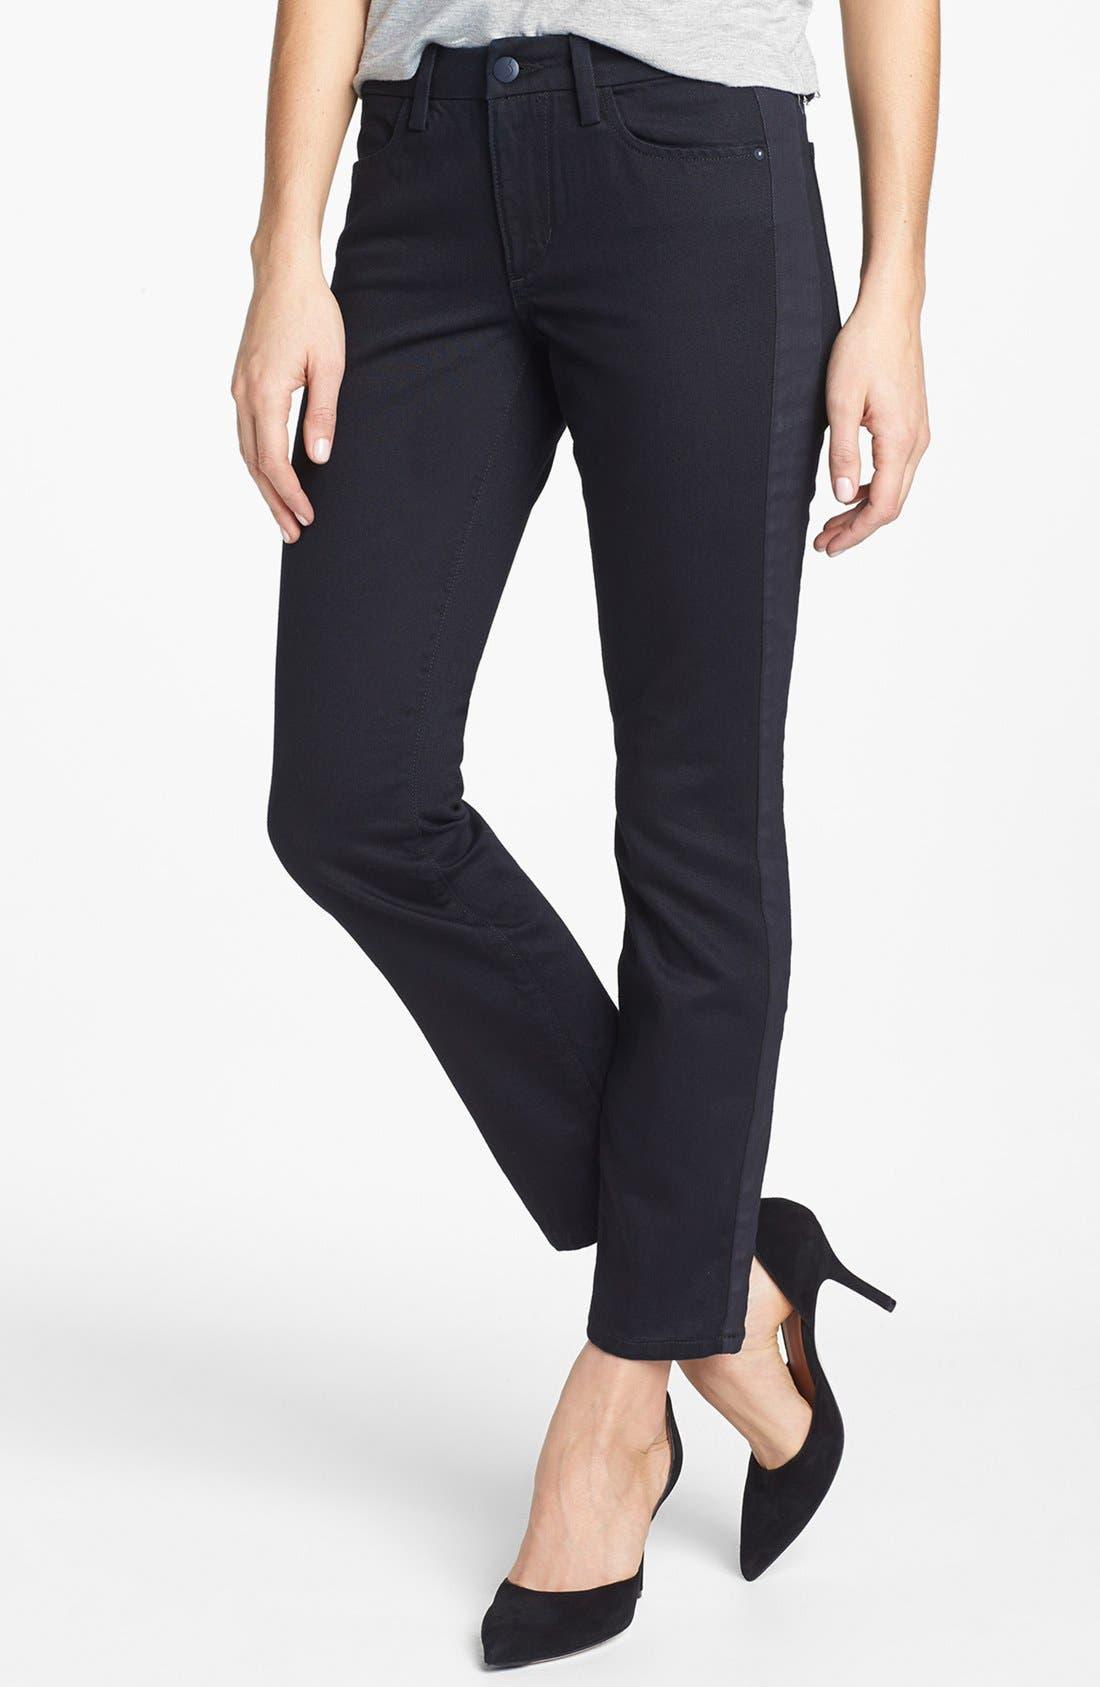 Main Image - Joe's Tuxedo Stripe Skinny Ankle Jeans (Pia)